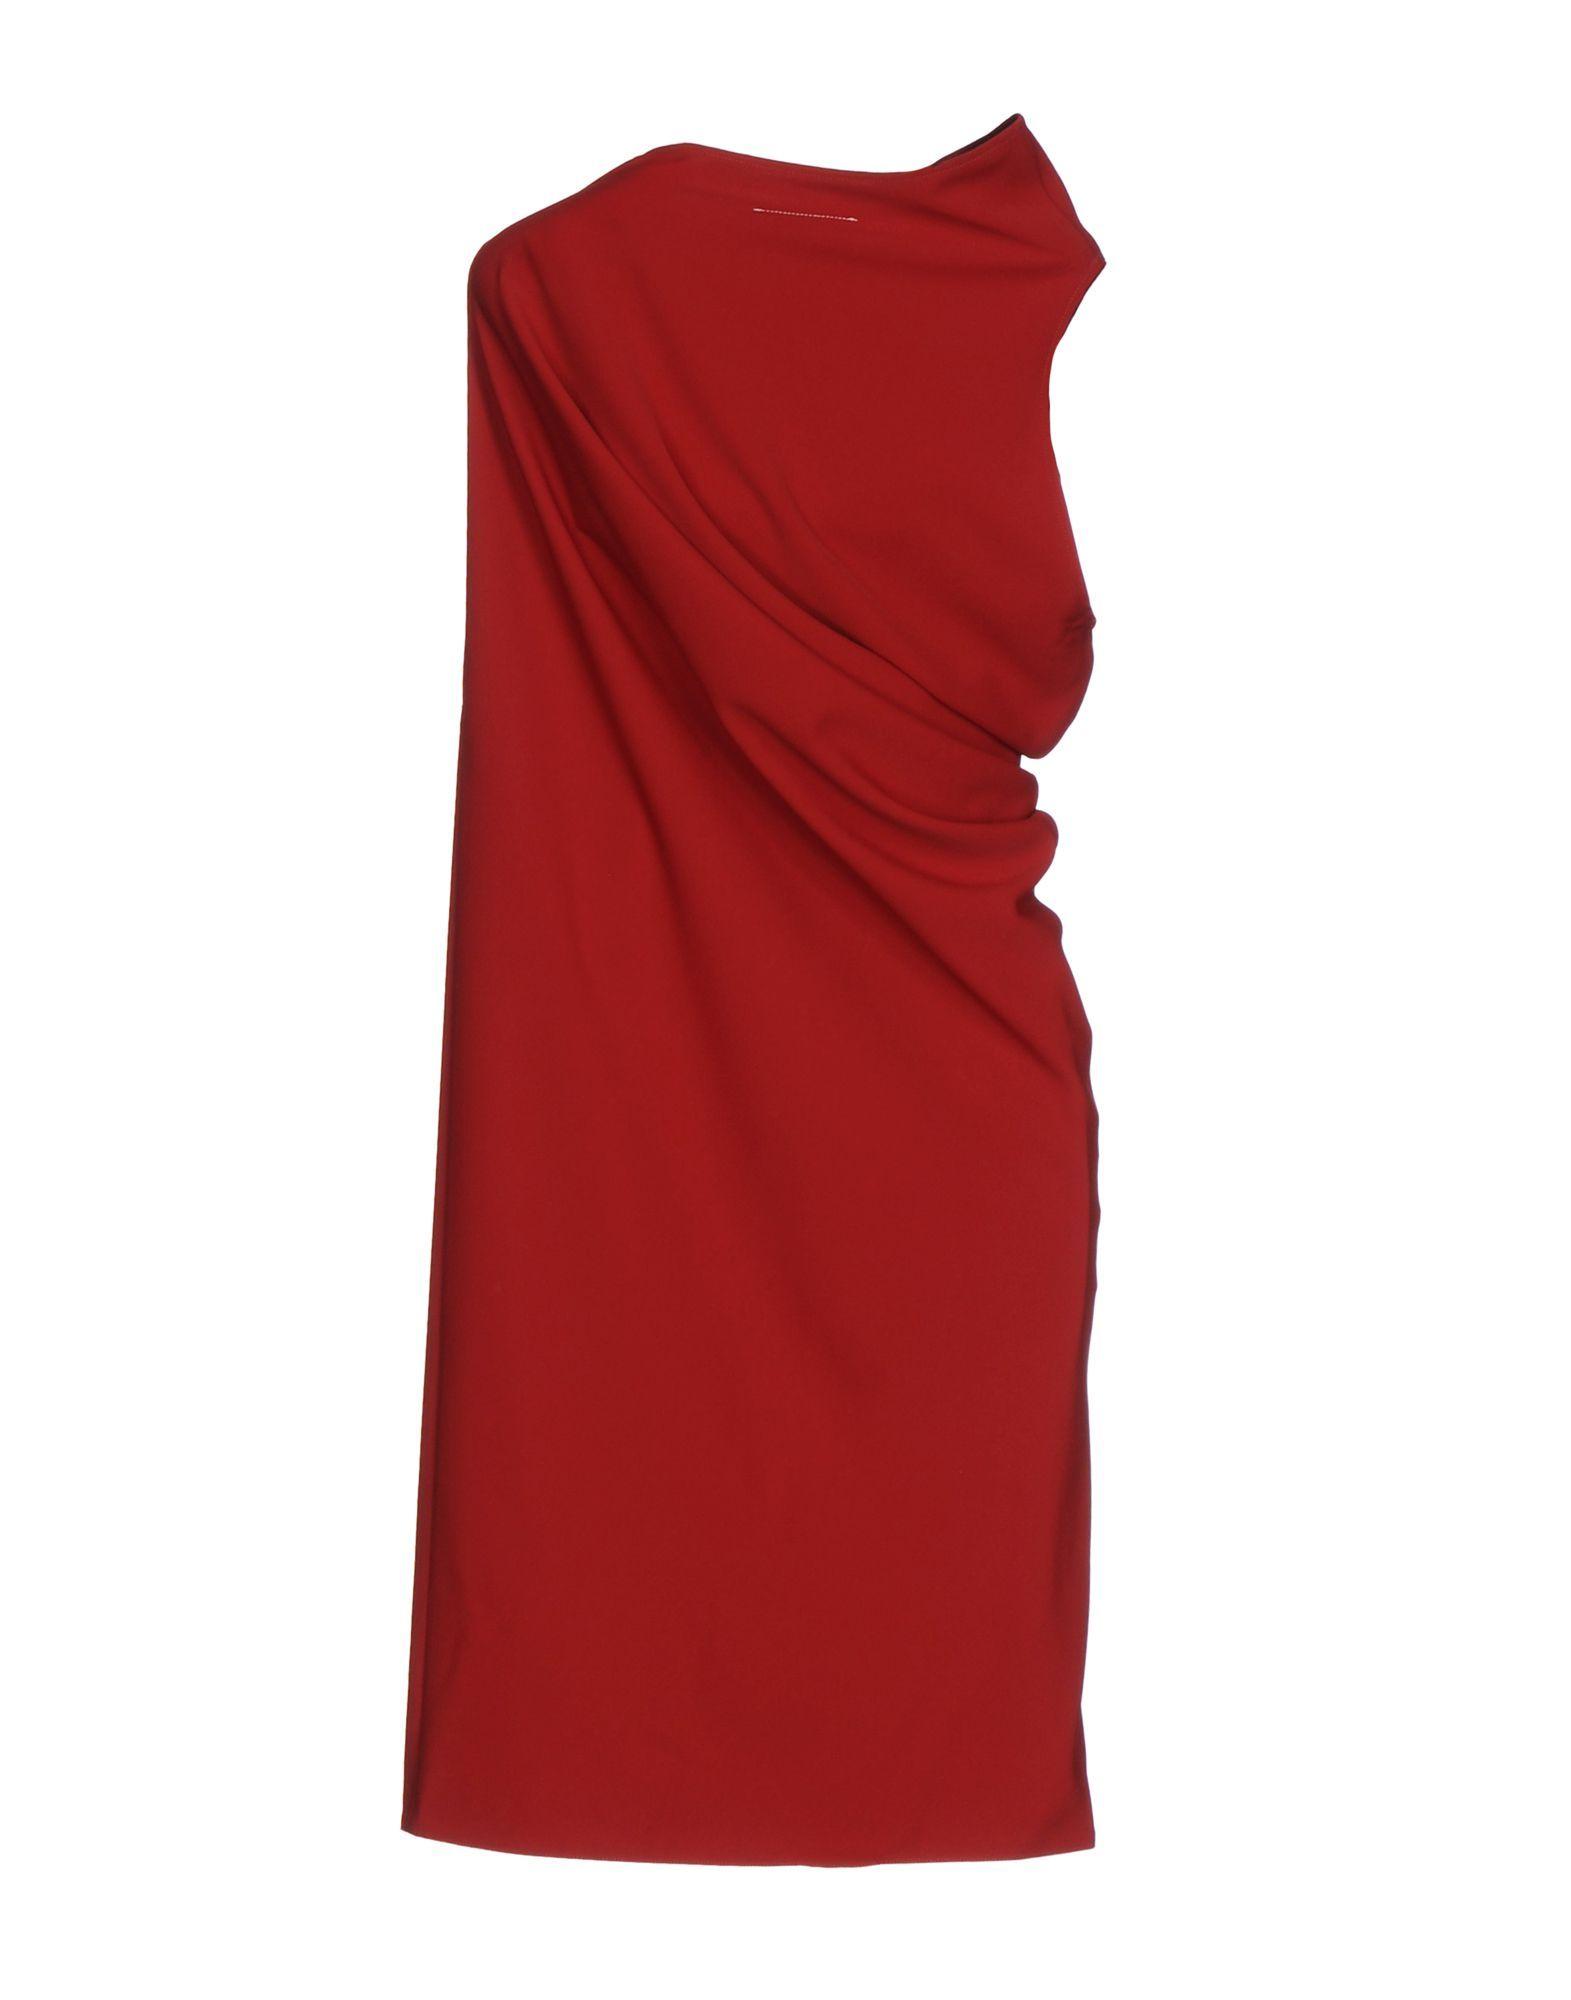 MM6 Maison Margiela Brick Red Draped Sleeveless Dress